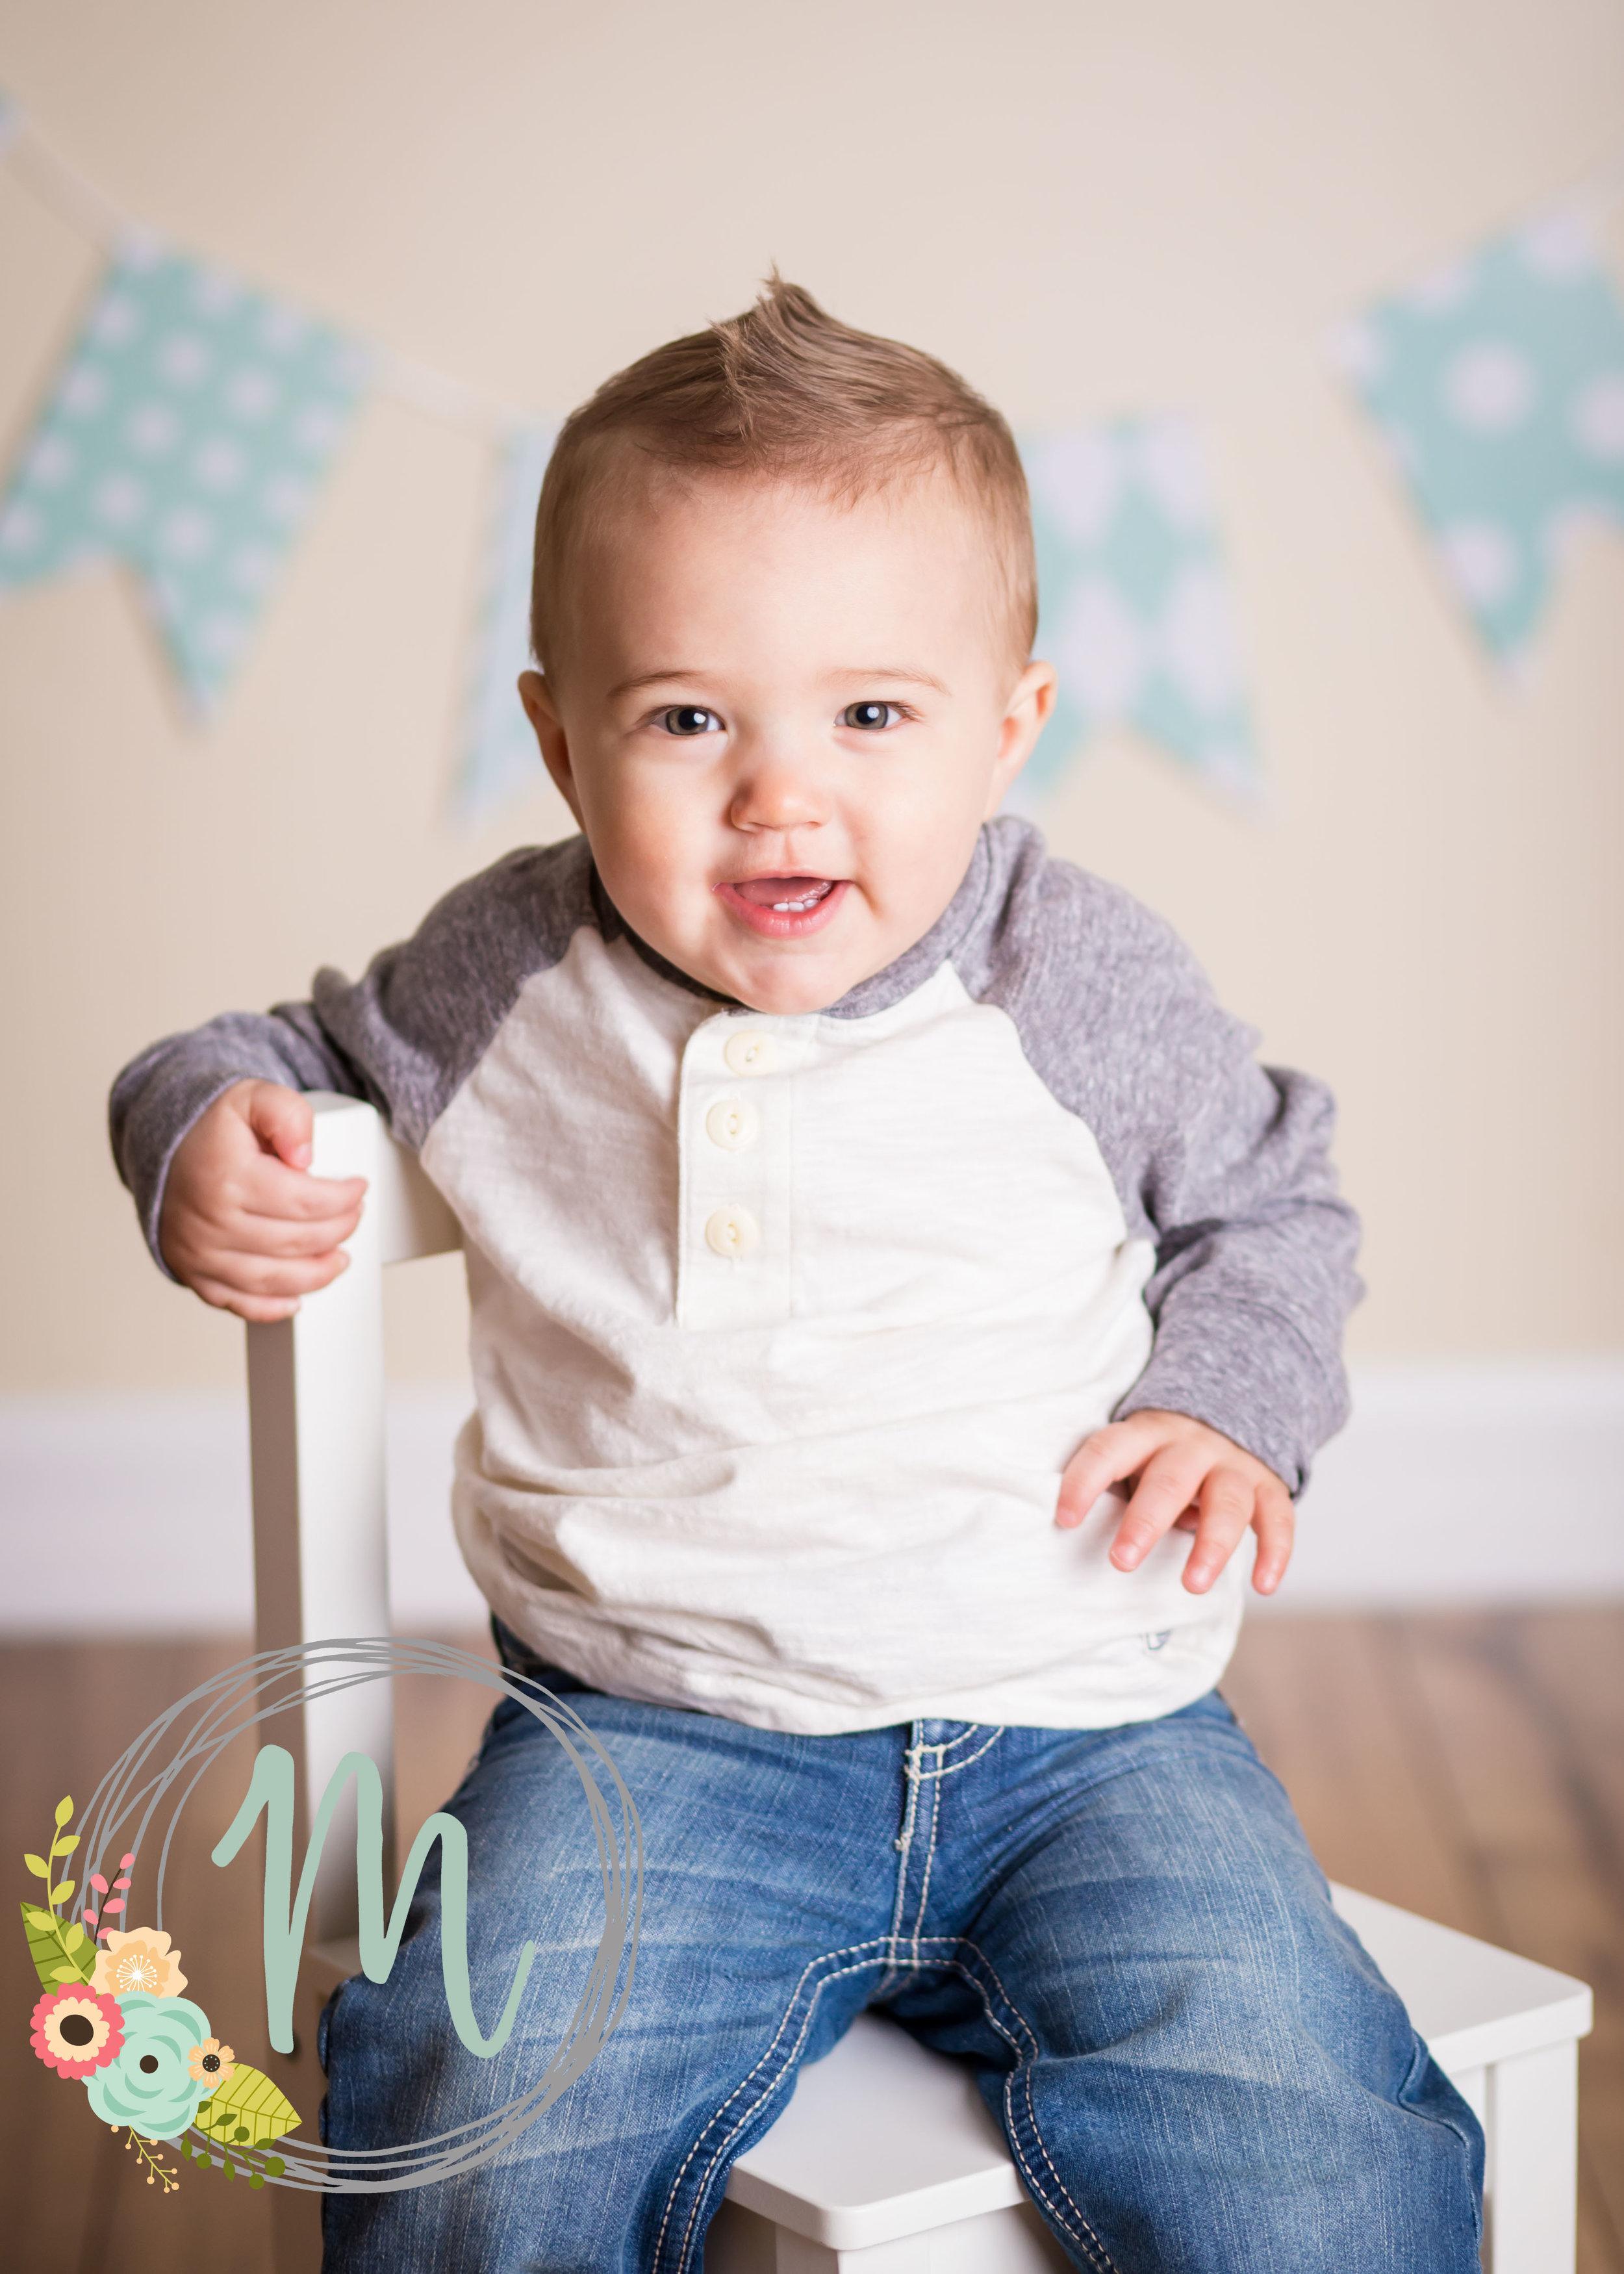 Mobie Photo - Lehi, Utah Baby Photographer